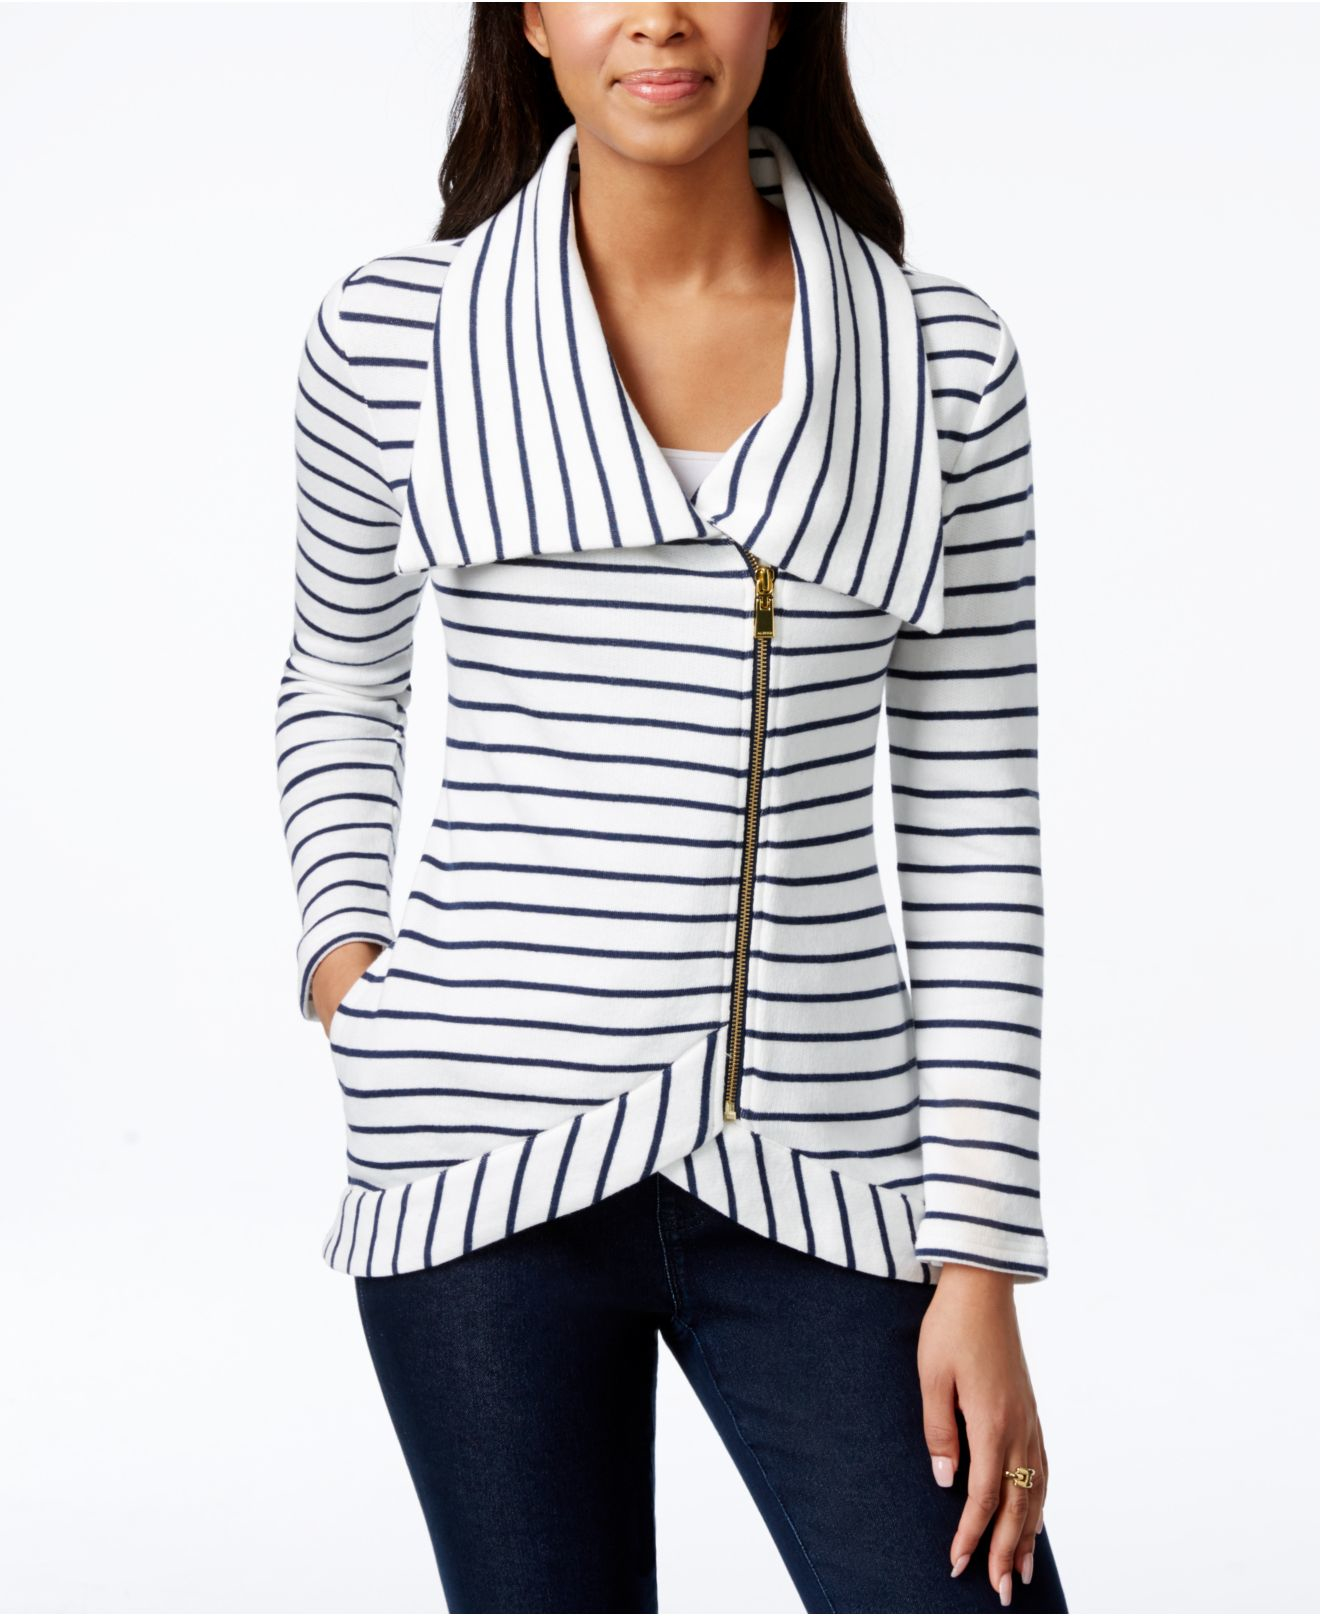 Lyst - Tommy Hilfiger Felina Striped Asymmetrical-zip Jacket in White 060ddc92dc